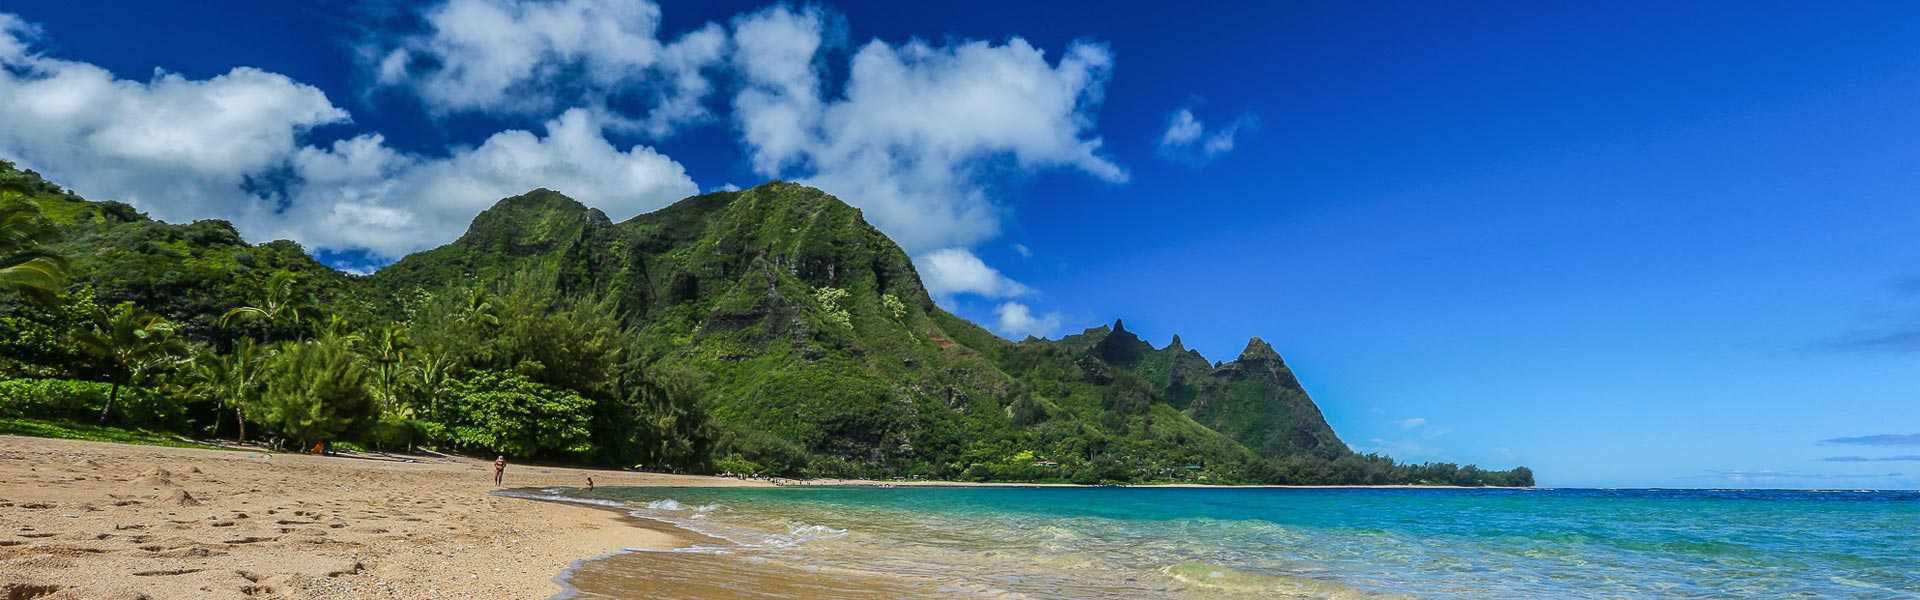 kauai real estate on pinterest kauai real estates and